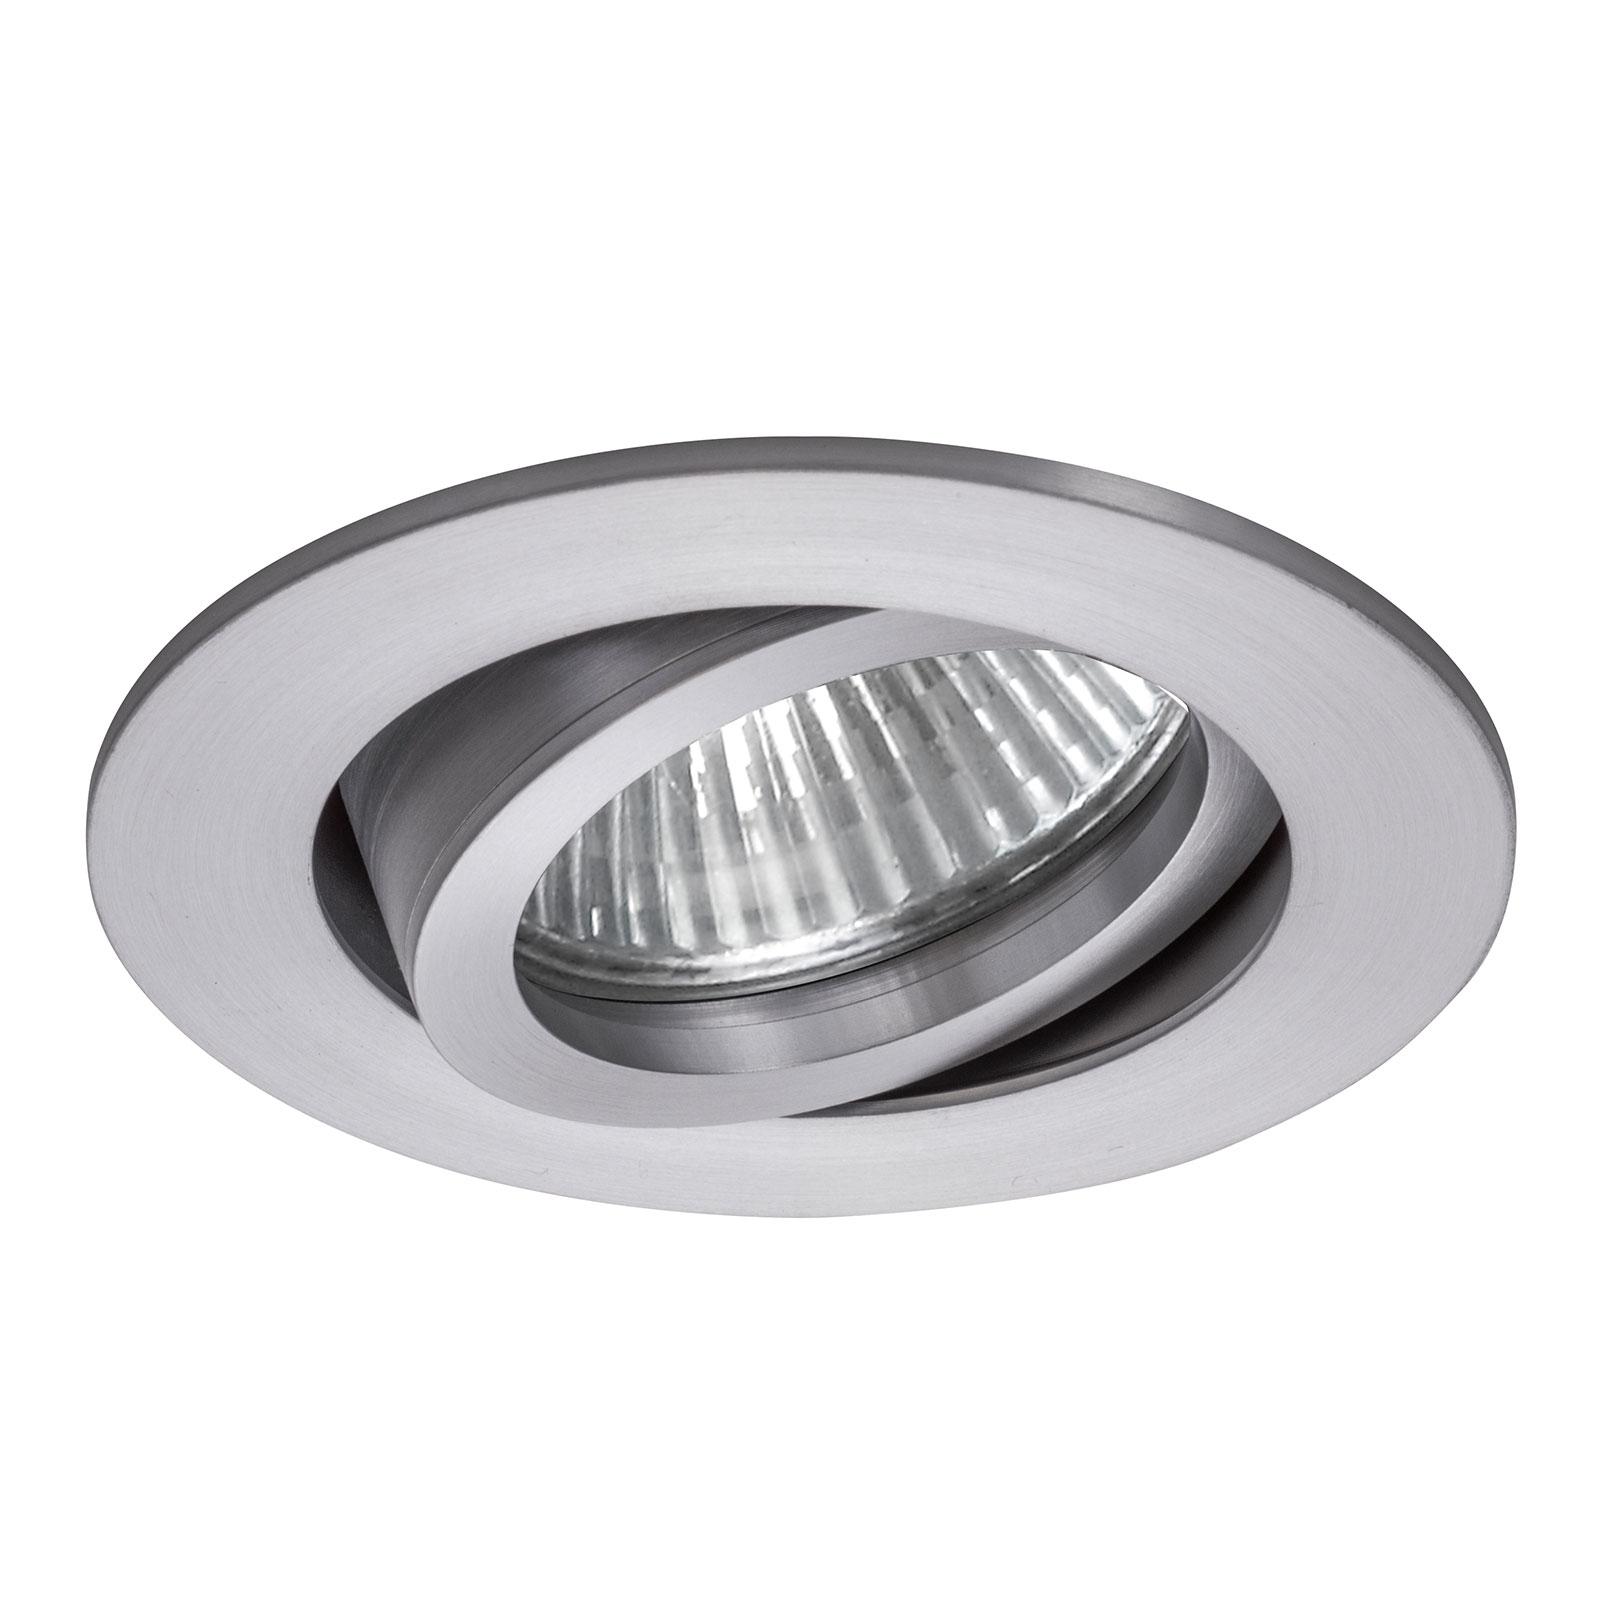 BRUMBERG 0063 Decken-Einbaustrahler rund aluminium